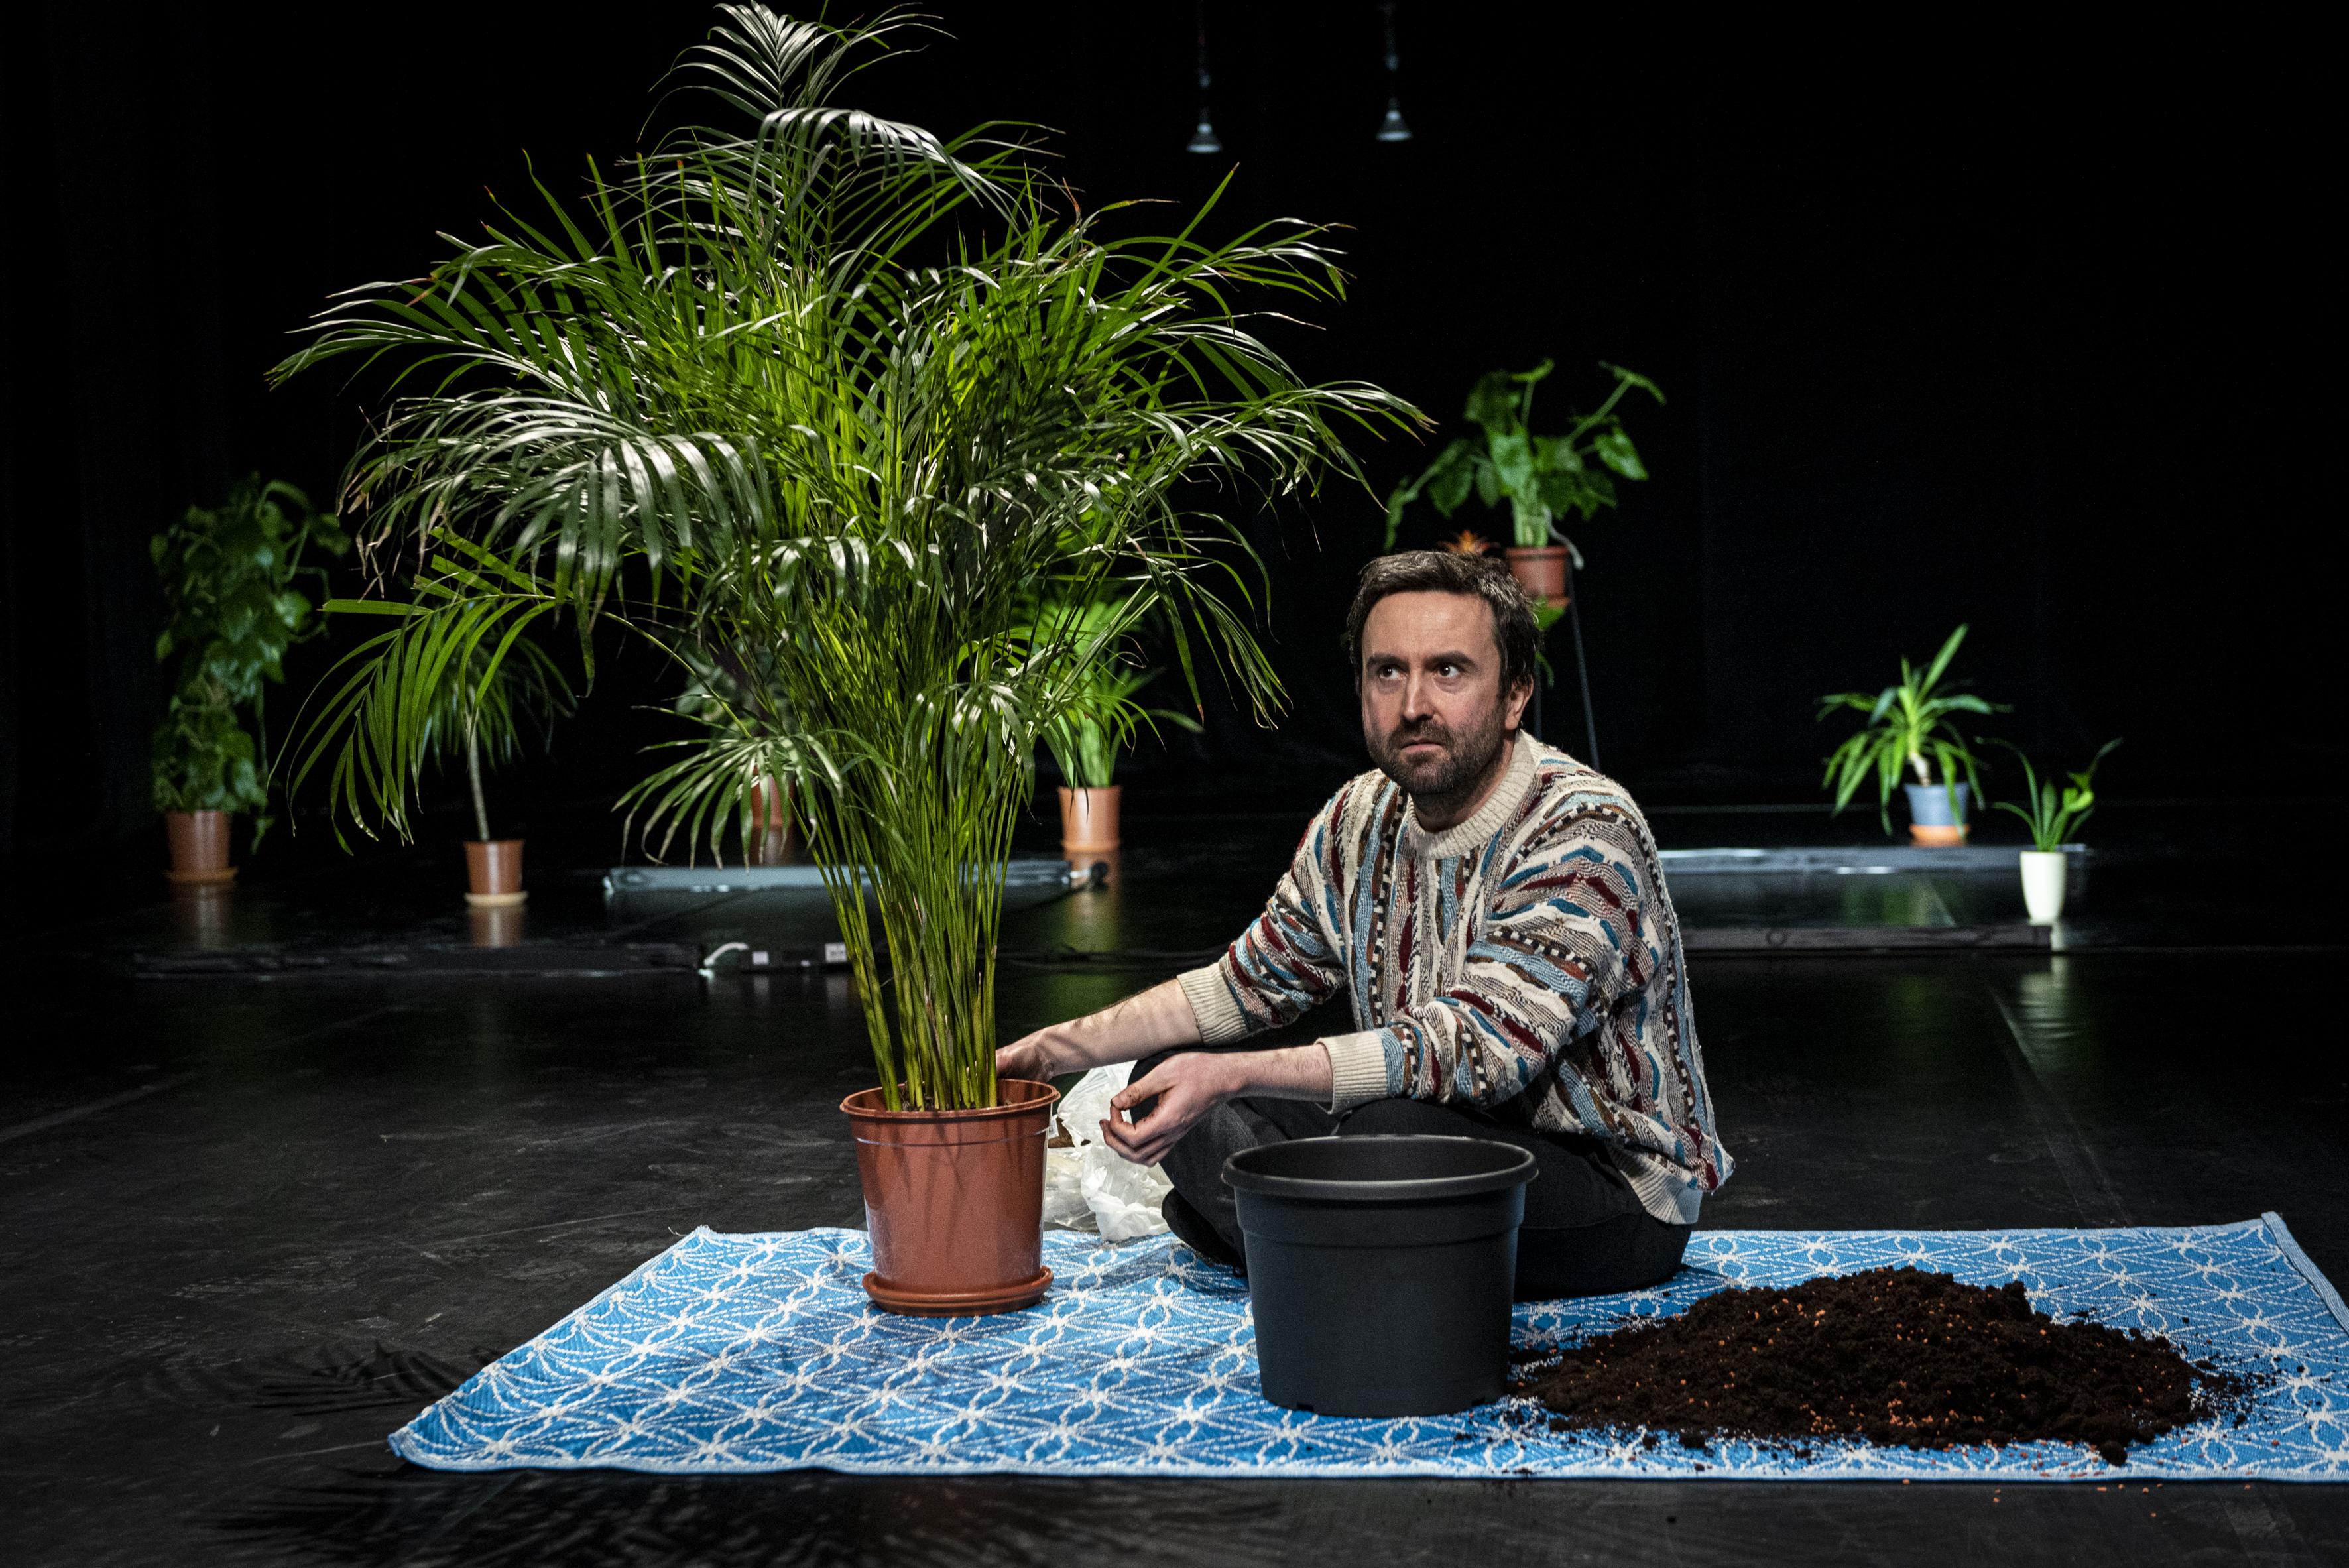 Dirty Debüt S2#8-romantic comedy | We have to talk by Romuald Krężel with René Alejandro Huari Mateus, Tamara Antonijević | Photo © Anna Agliardi